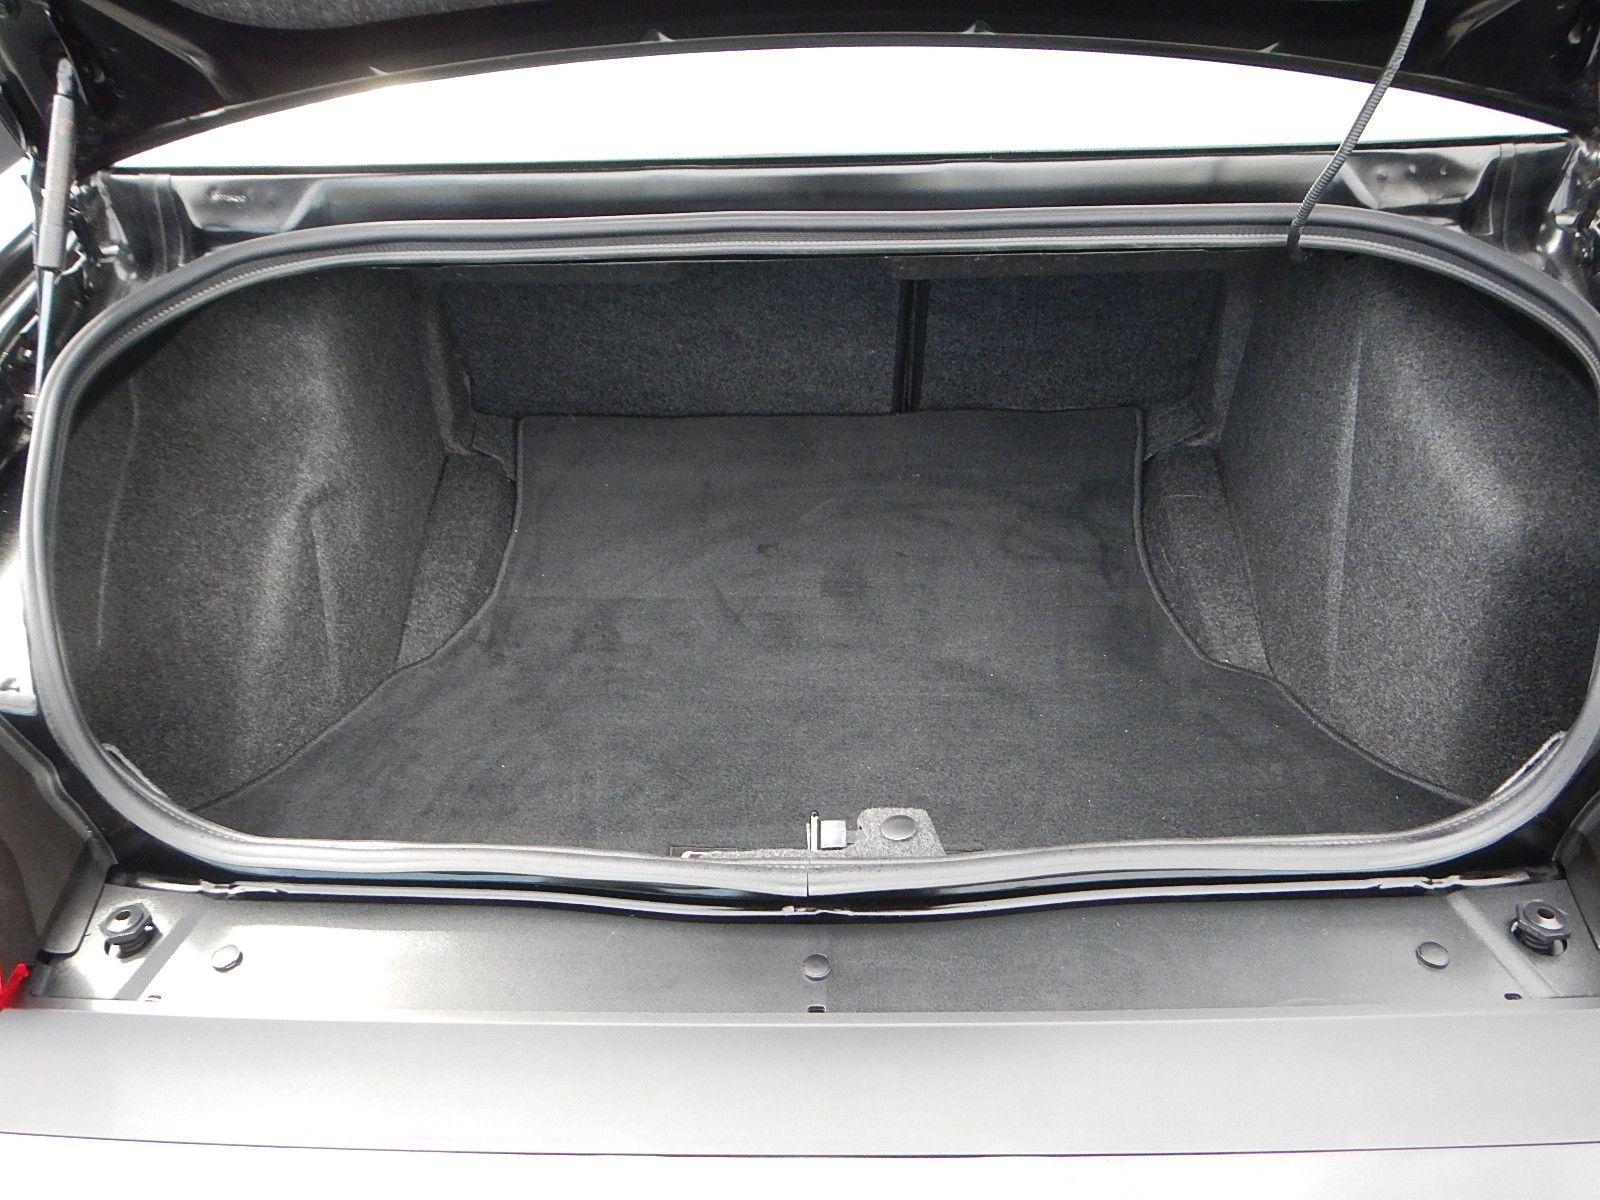 2013 Dodge Challenger 013.jpg